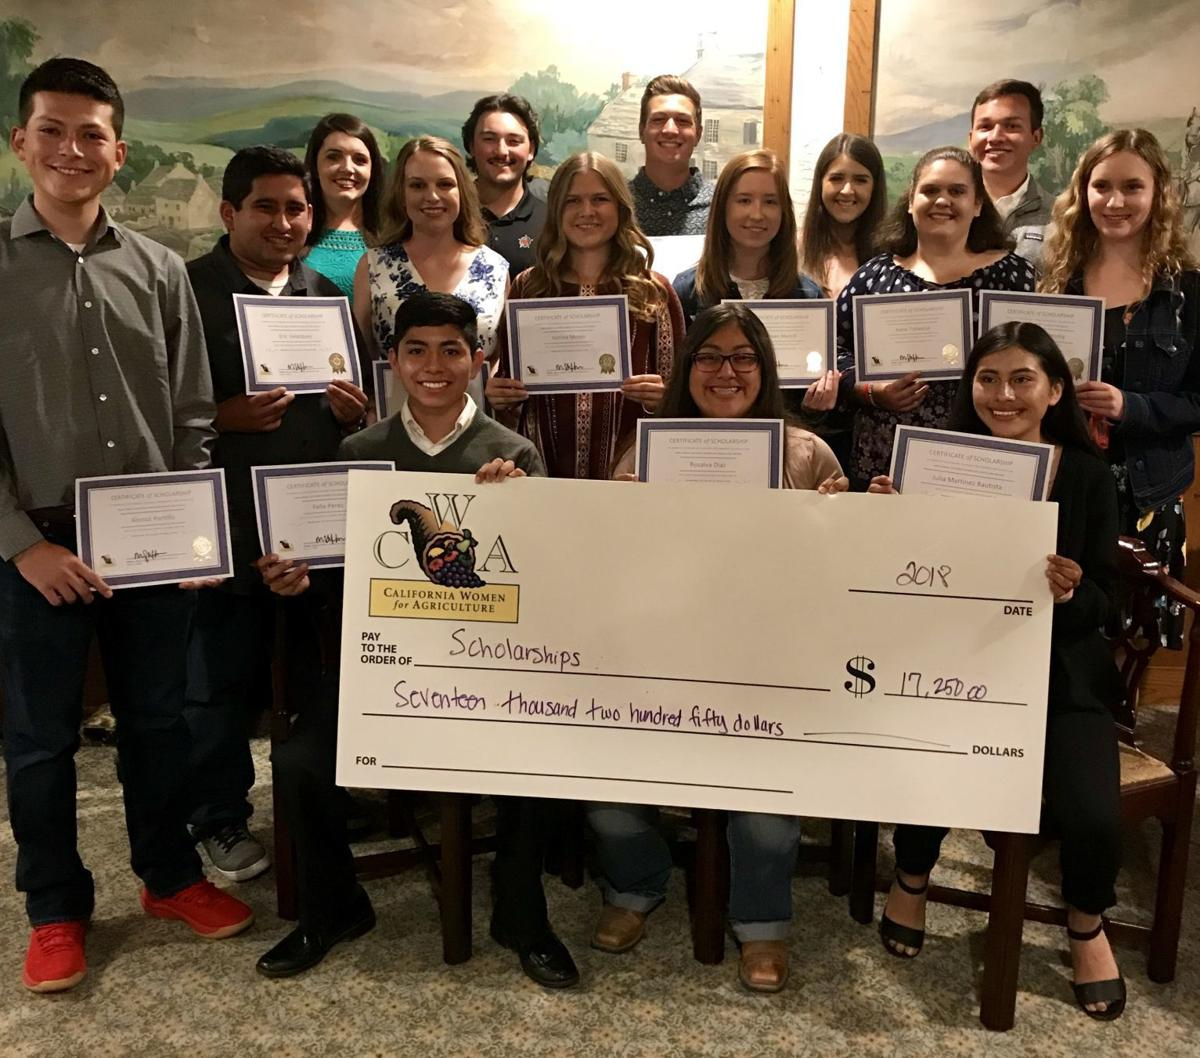 2018 CWA student scholarships